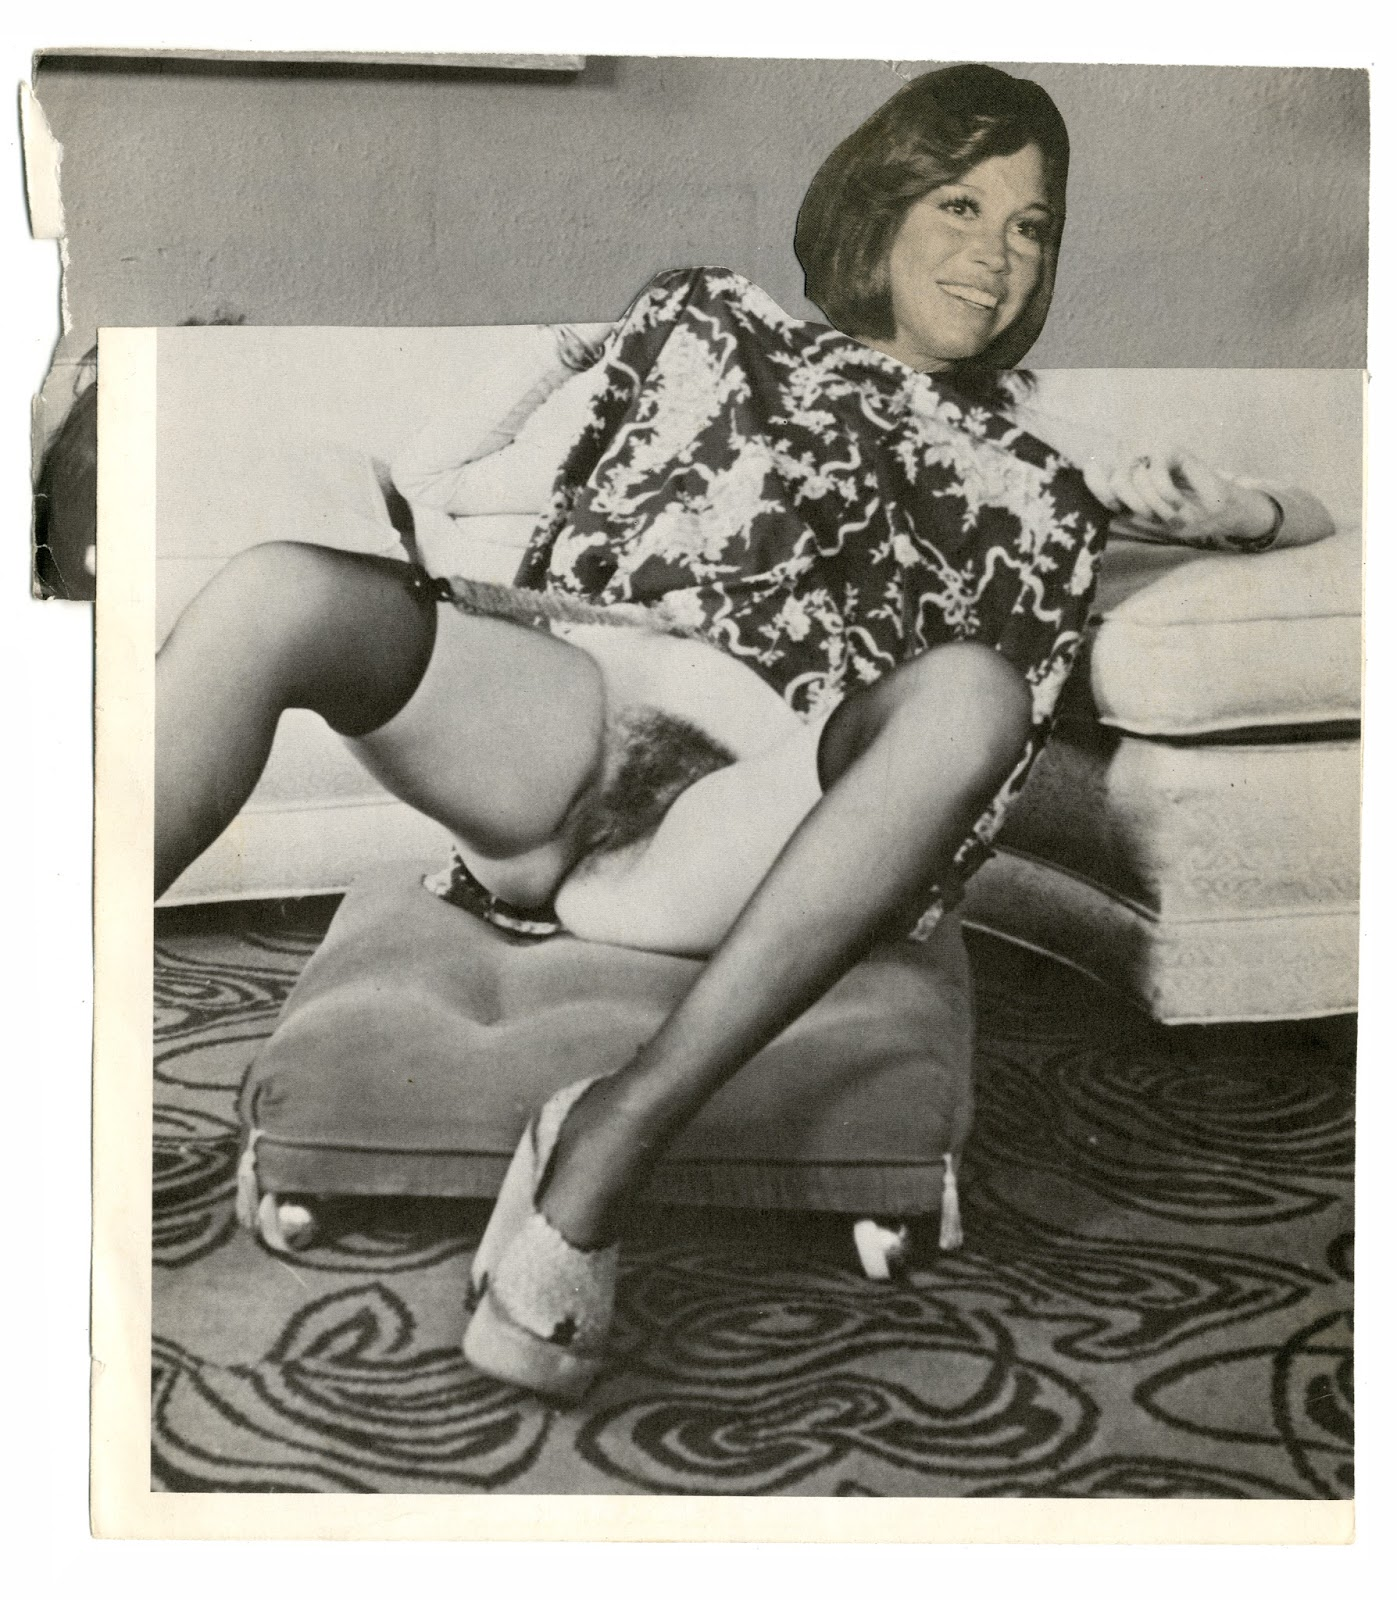 mary-tyler-moore-playboy-eritrian-naked-girls